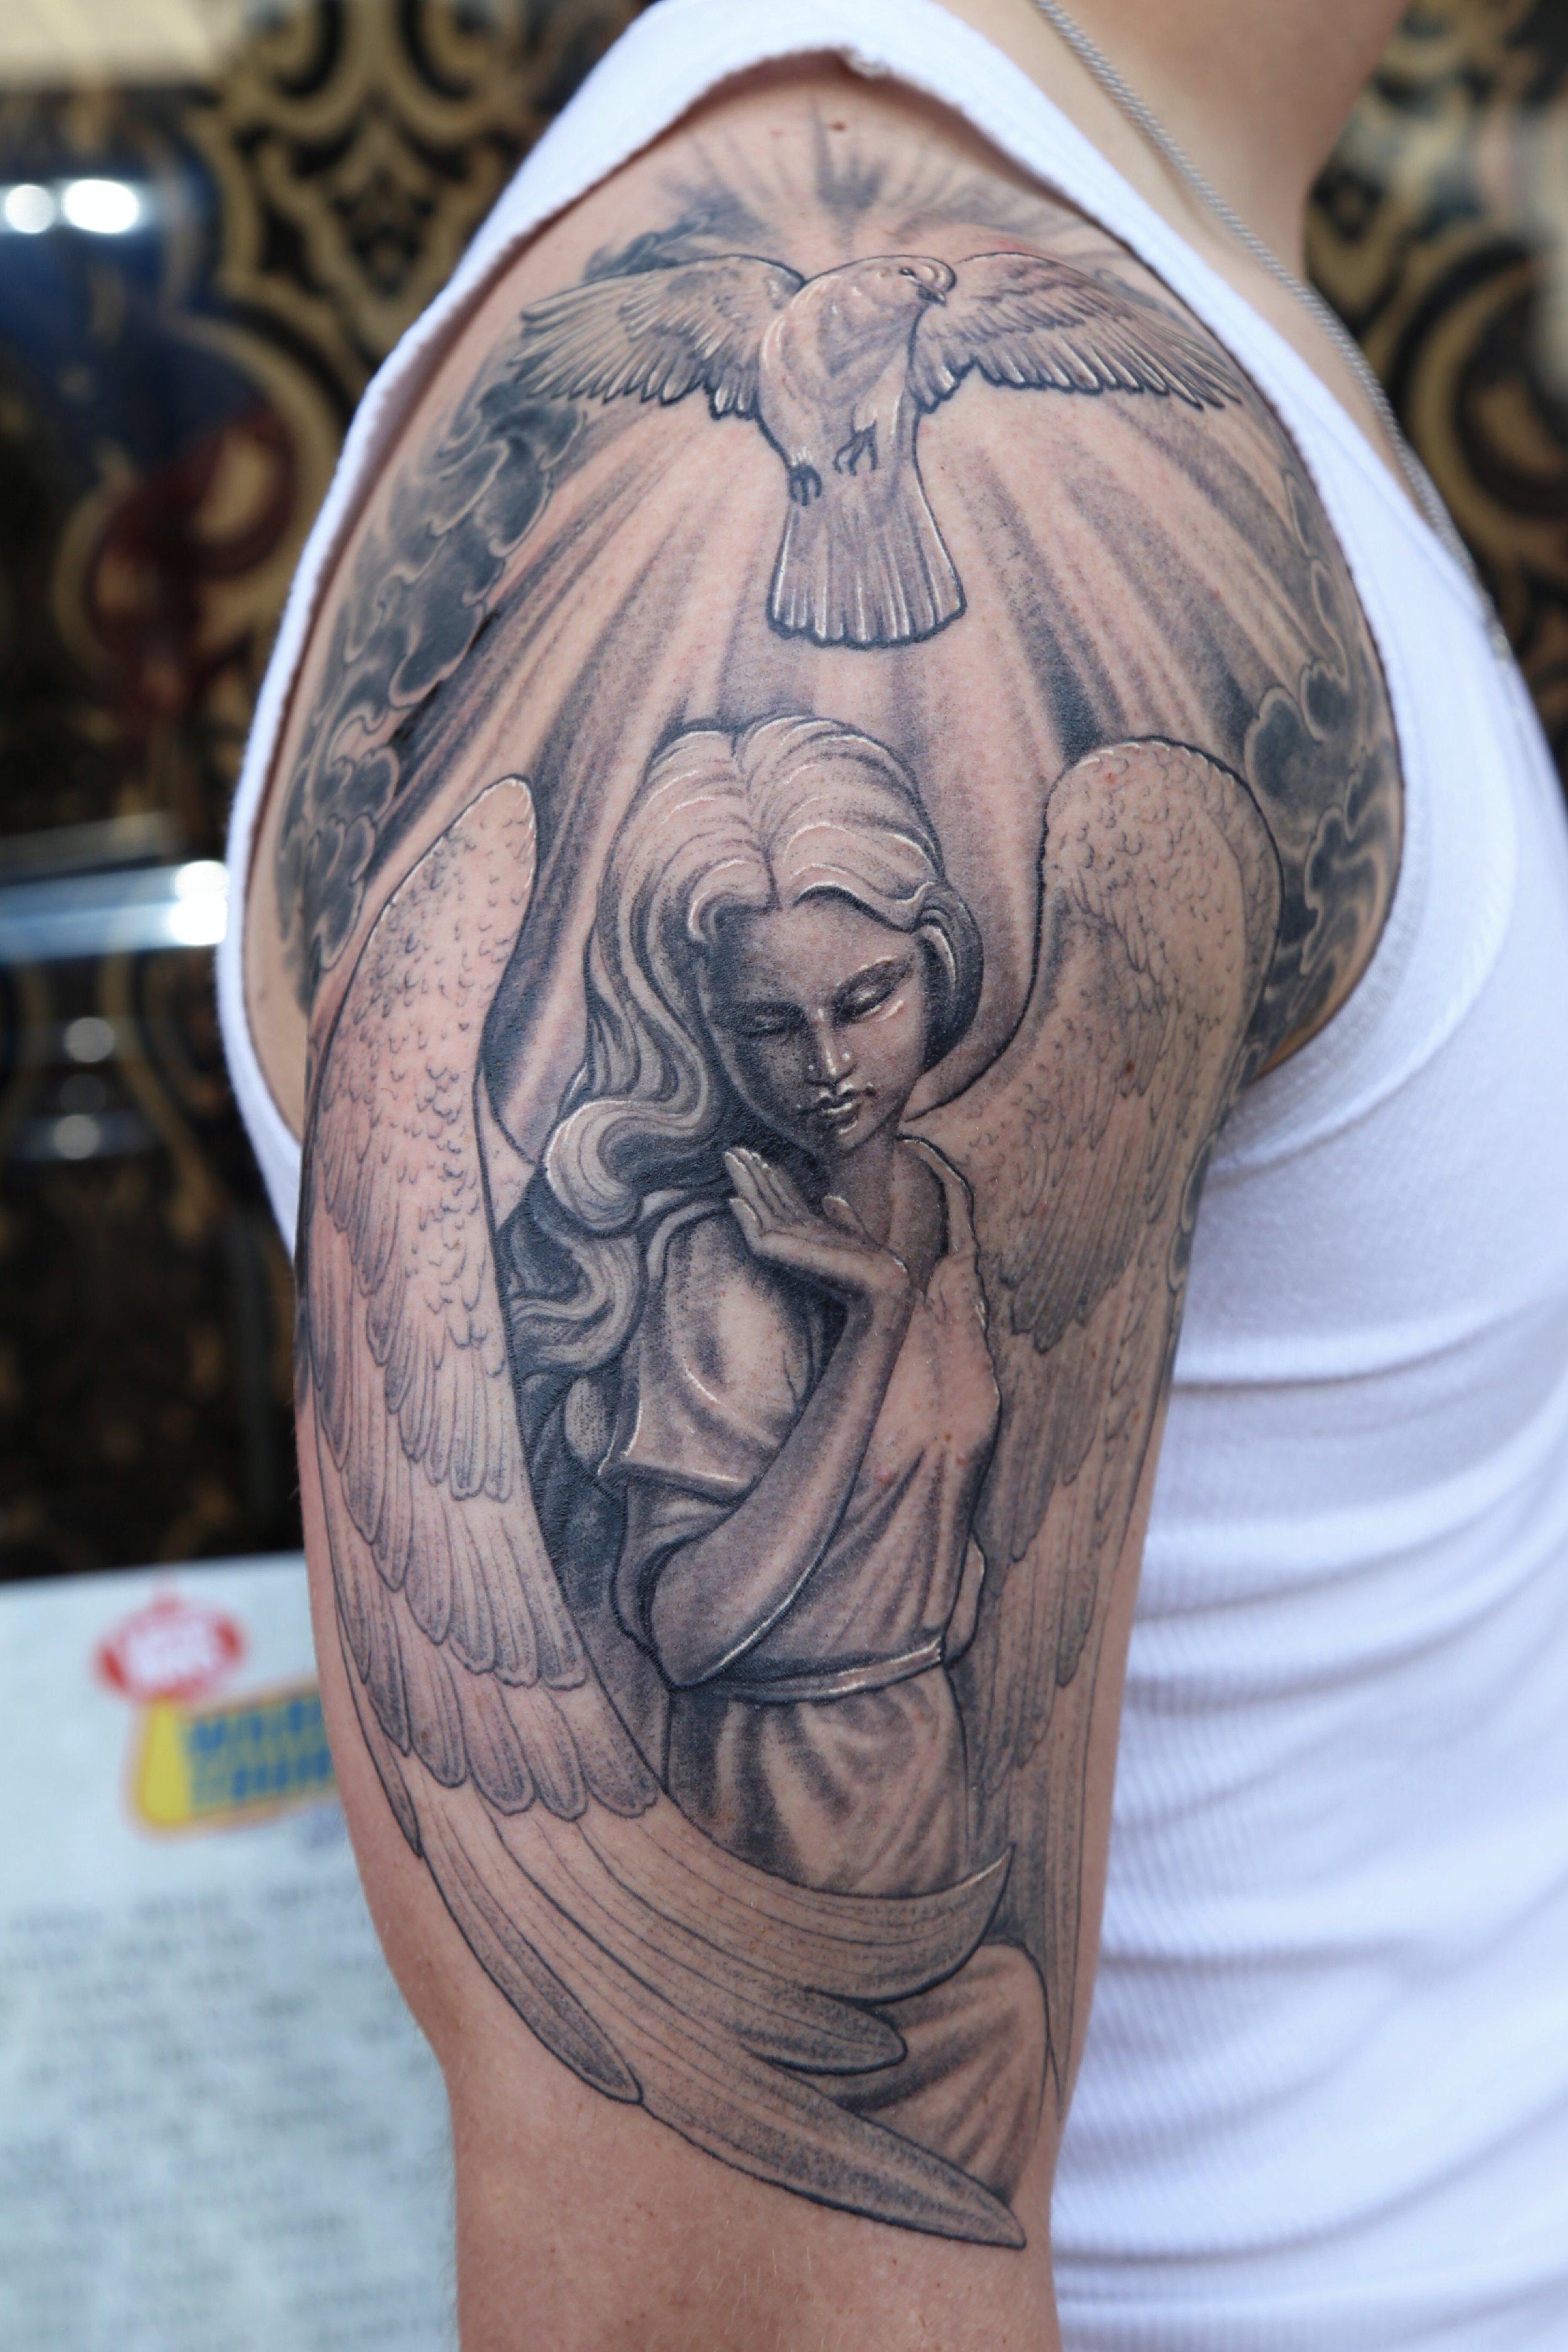 enrique bernal ejay tattoo dallas texas angel.jpeg